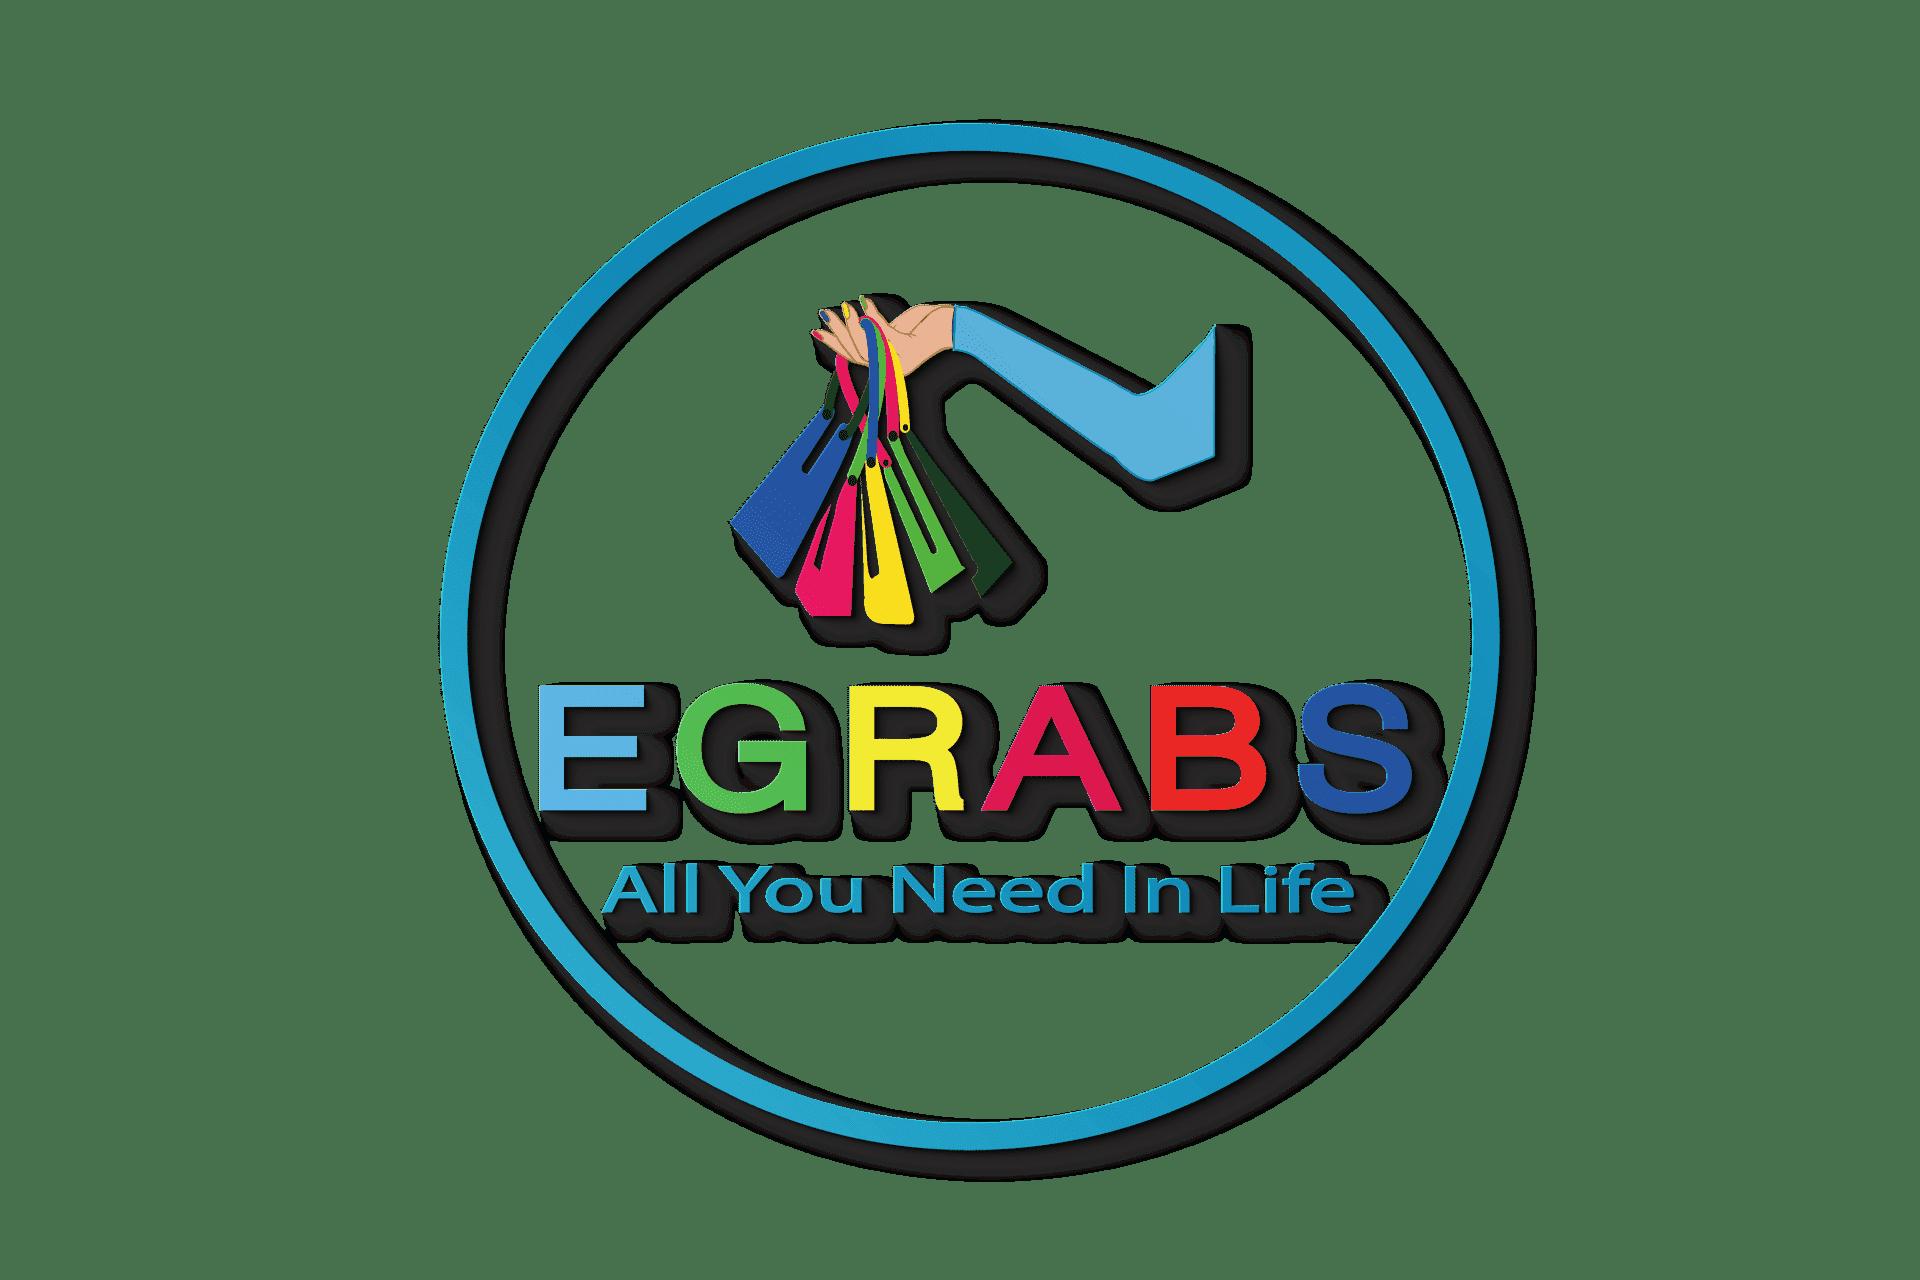 Egrabs skincare